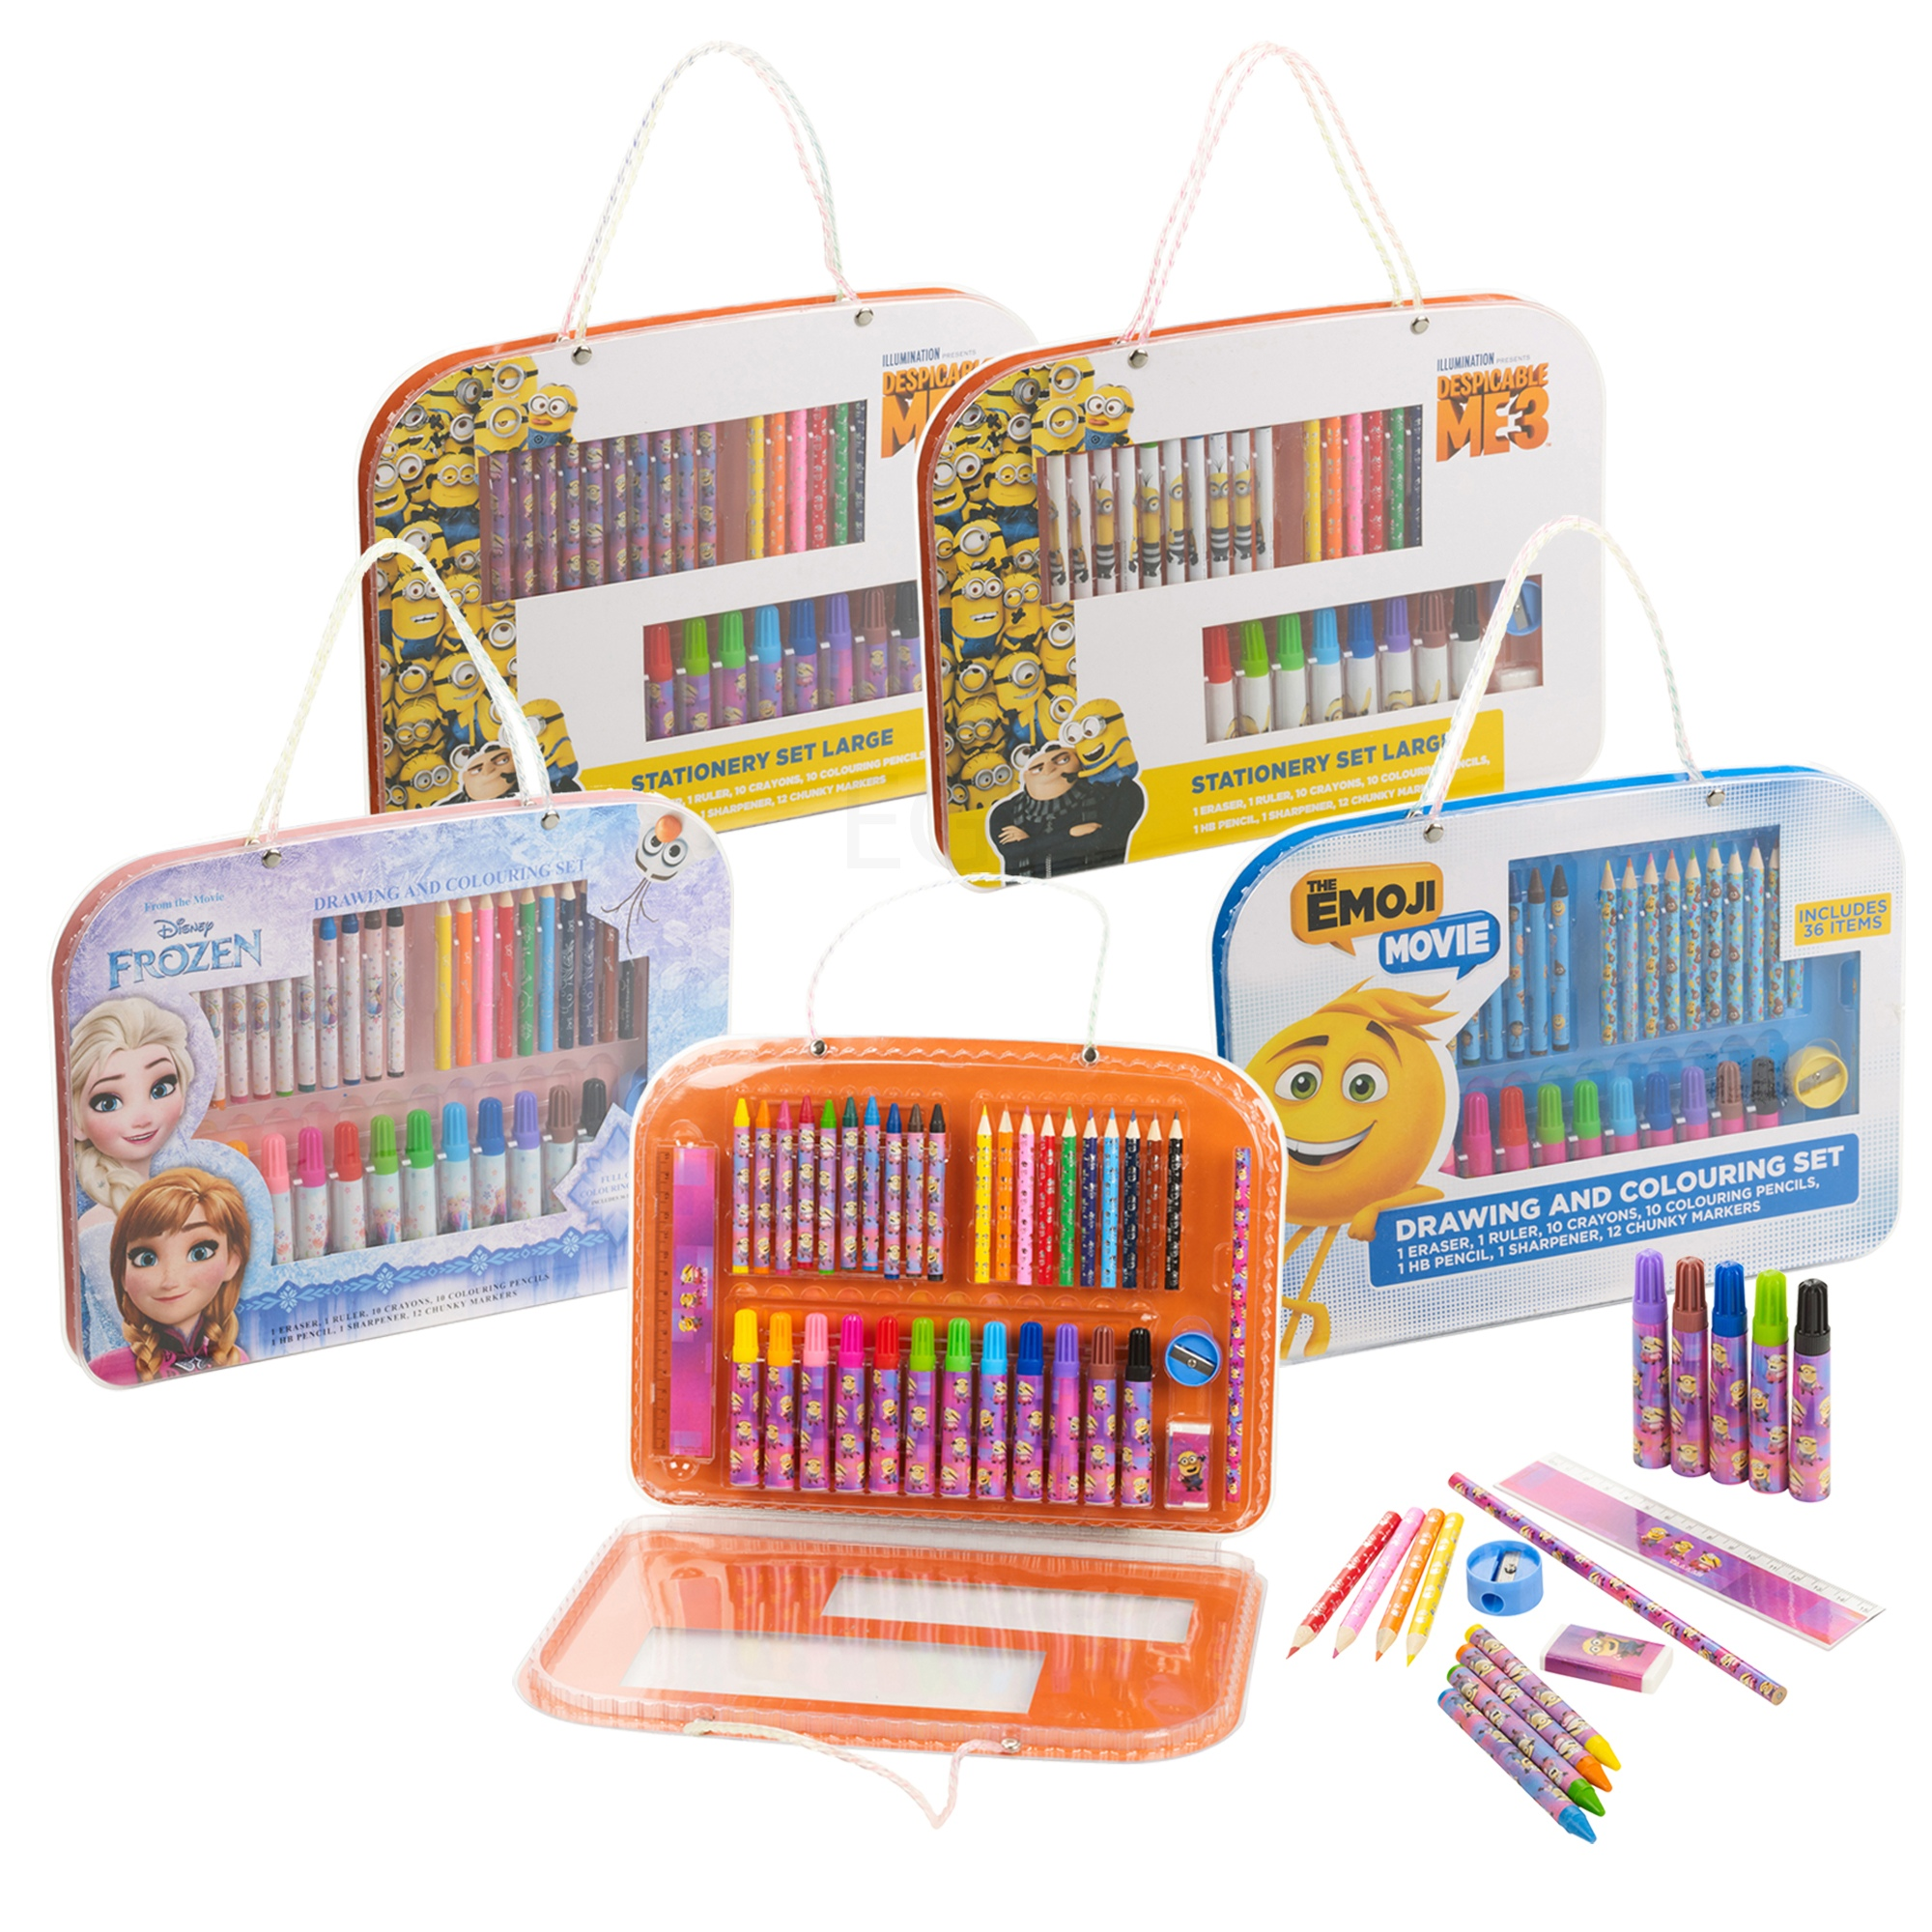 Details about Disney Kids 37pc Art Set Travel Case Drawing Pencil Marker  Crayon Coloring Ruler